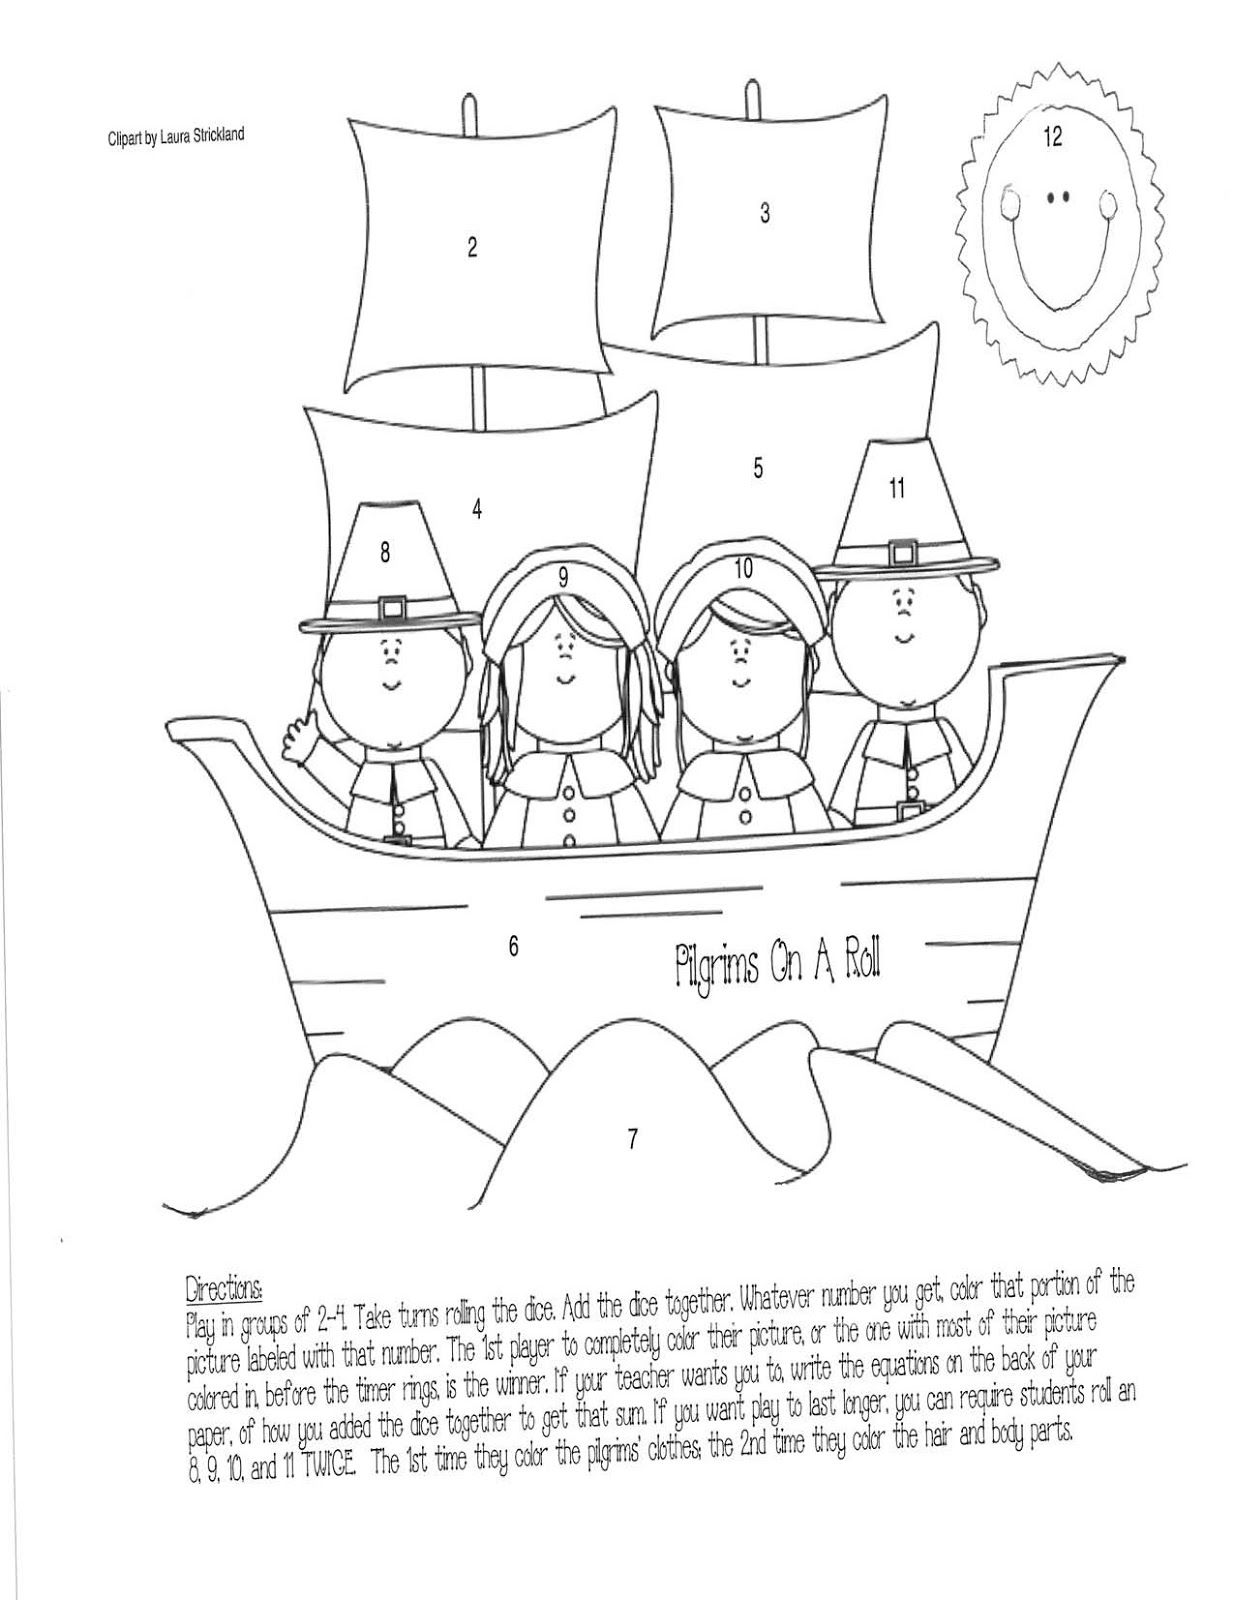 Mayflower Addition Game